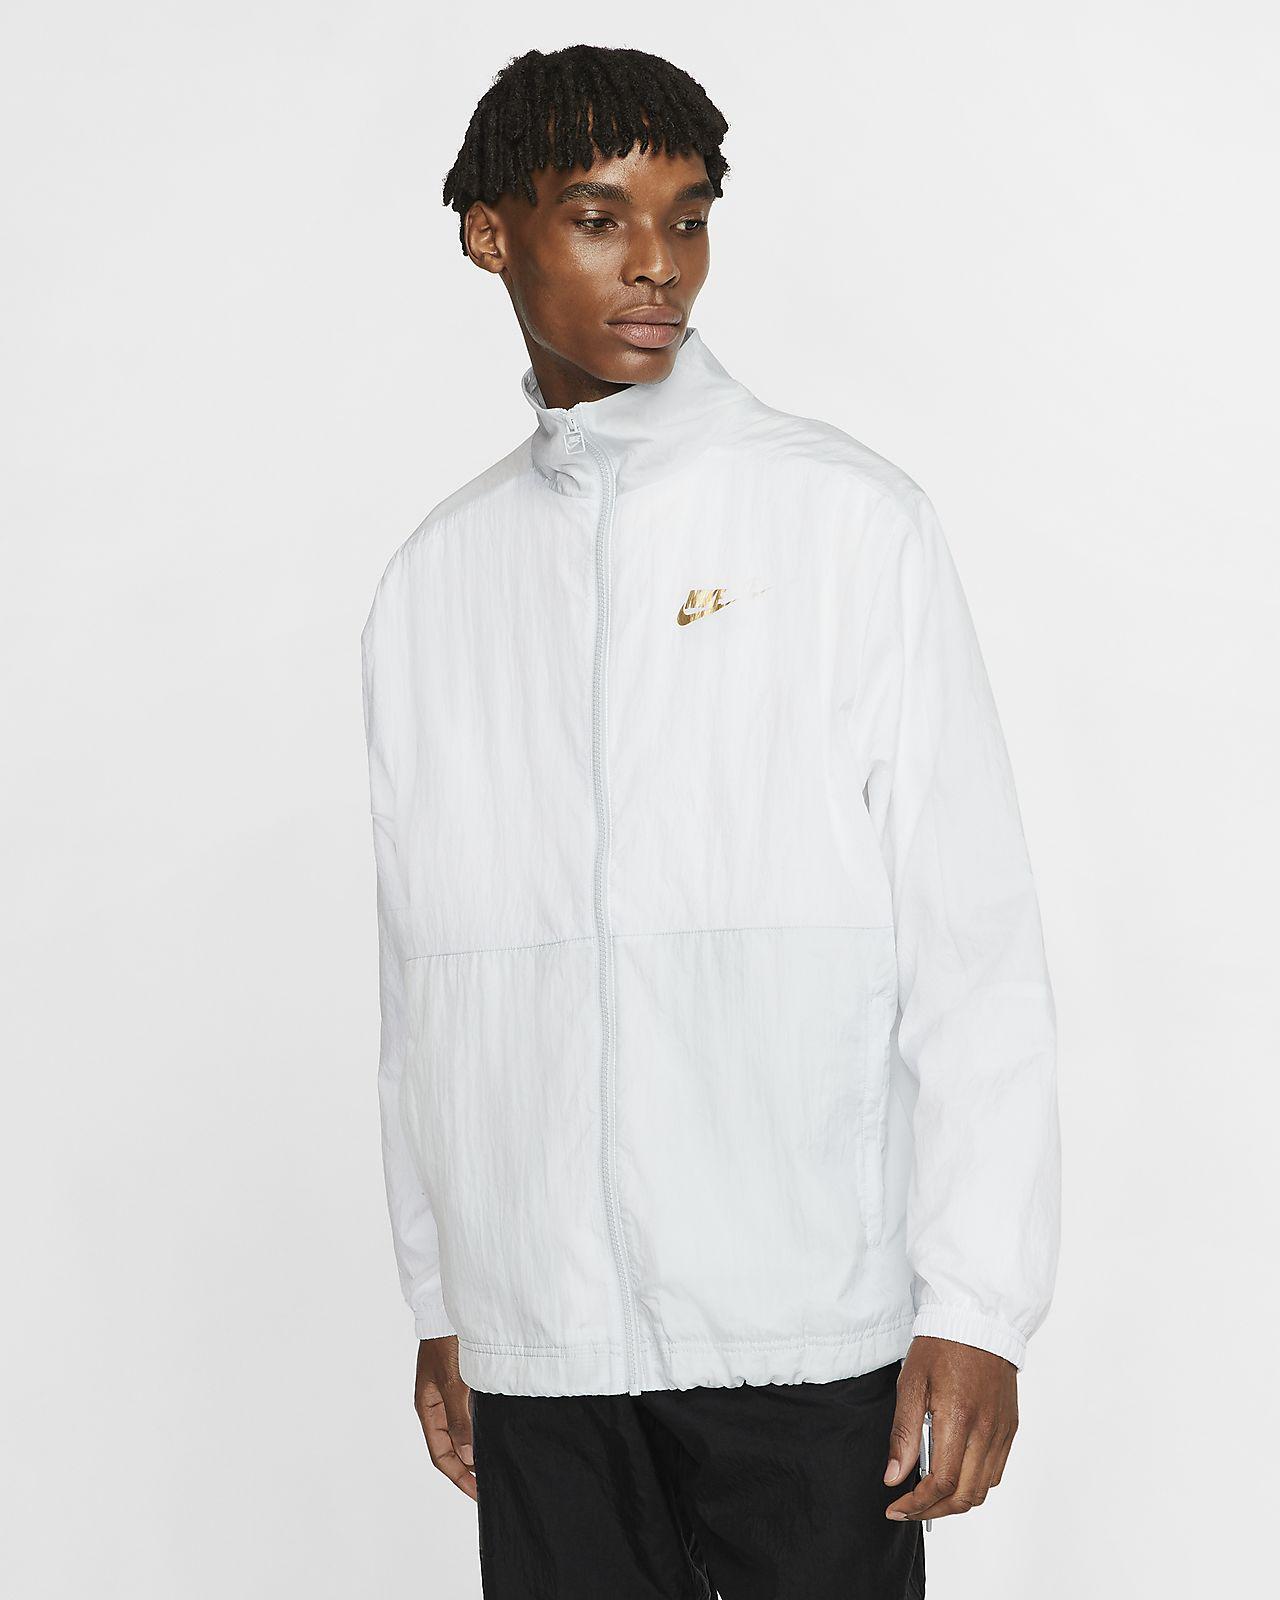 Tkaná bunda Nike Sportswear